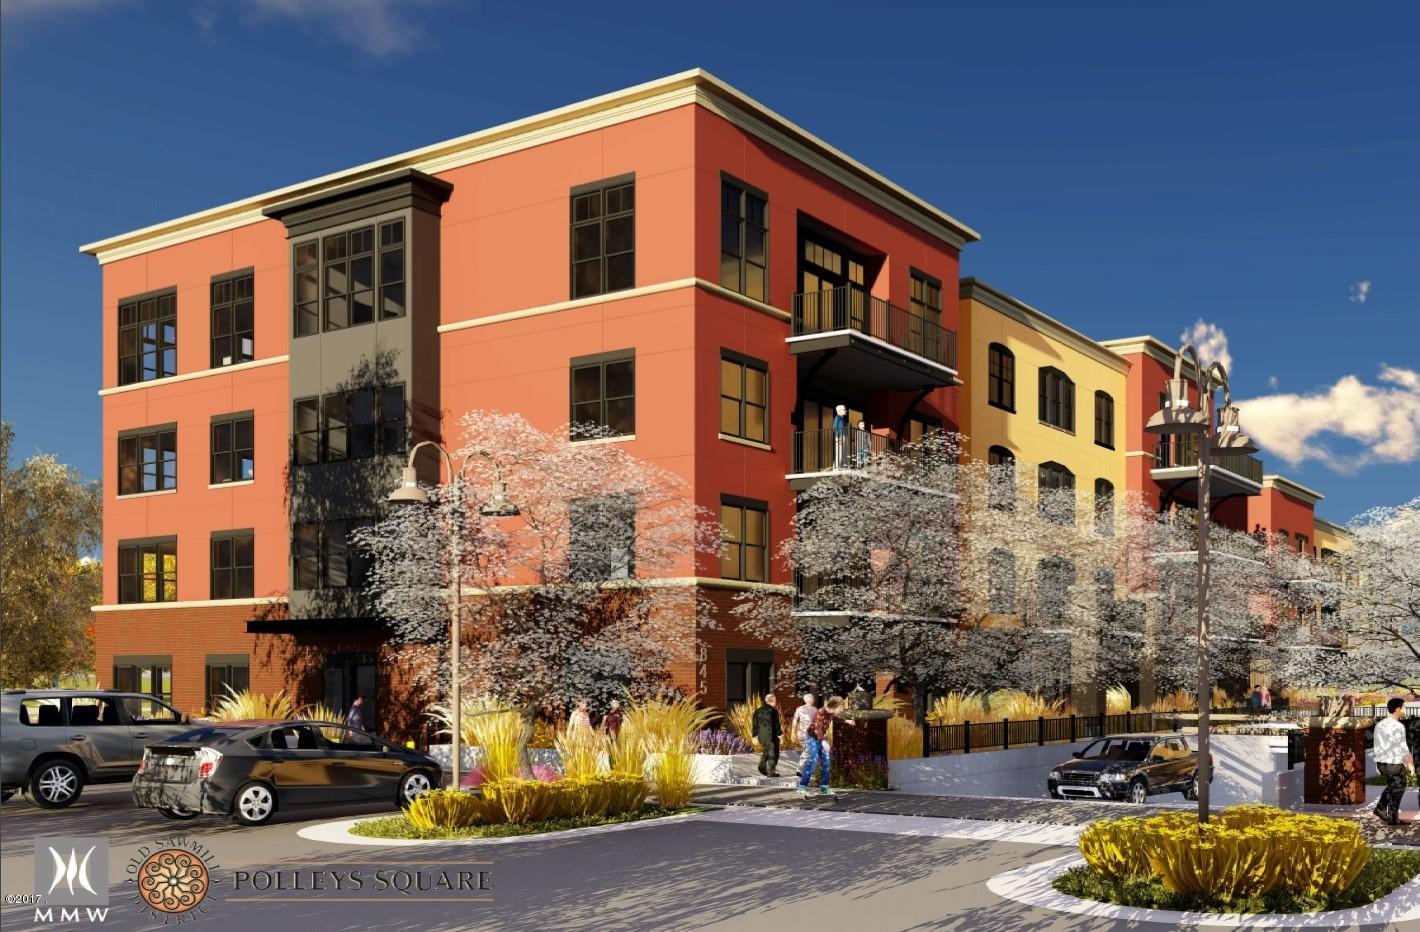 845 Wyoming Street Suite 206, Missoula, MT 59801